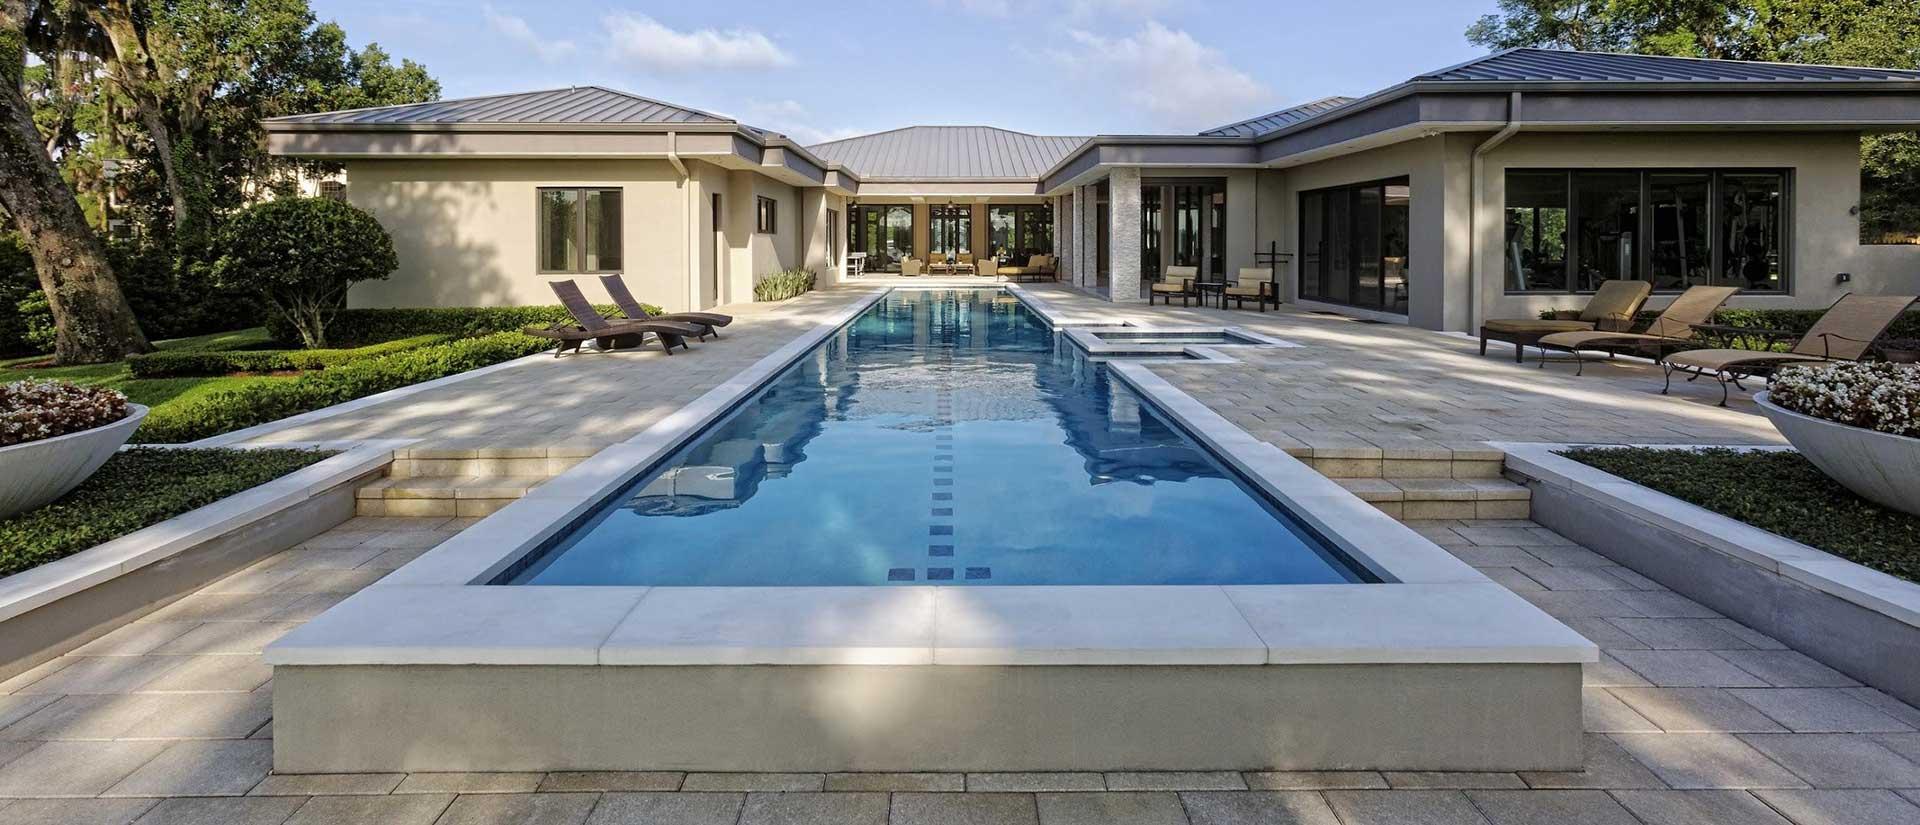 Pam Buda - Sonoma County Real Estate